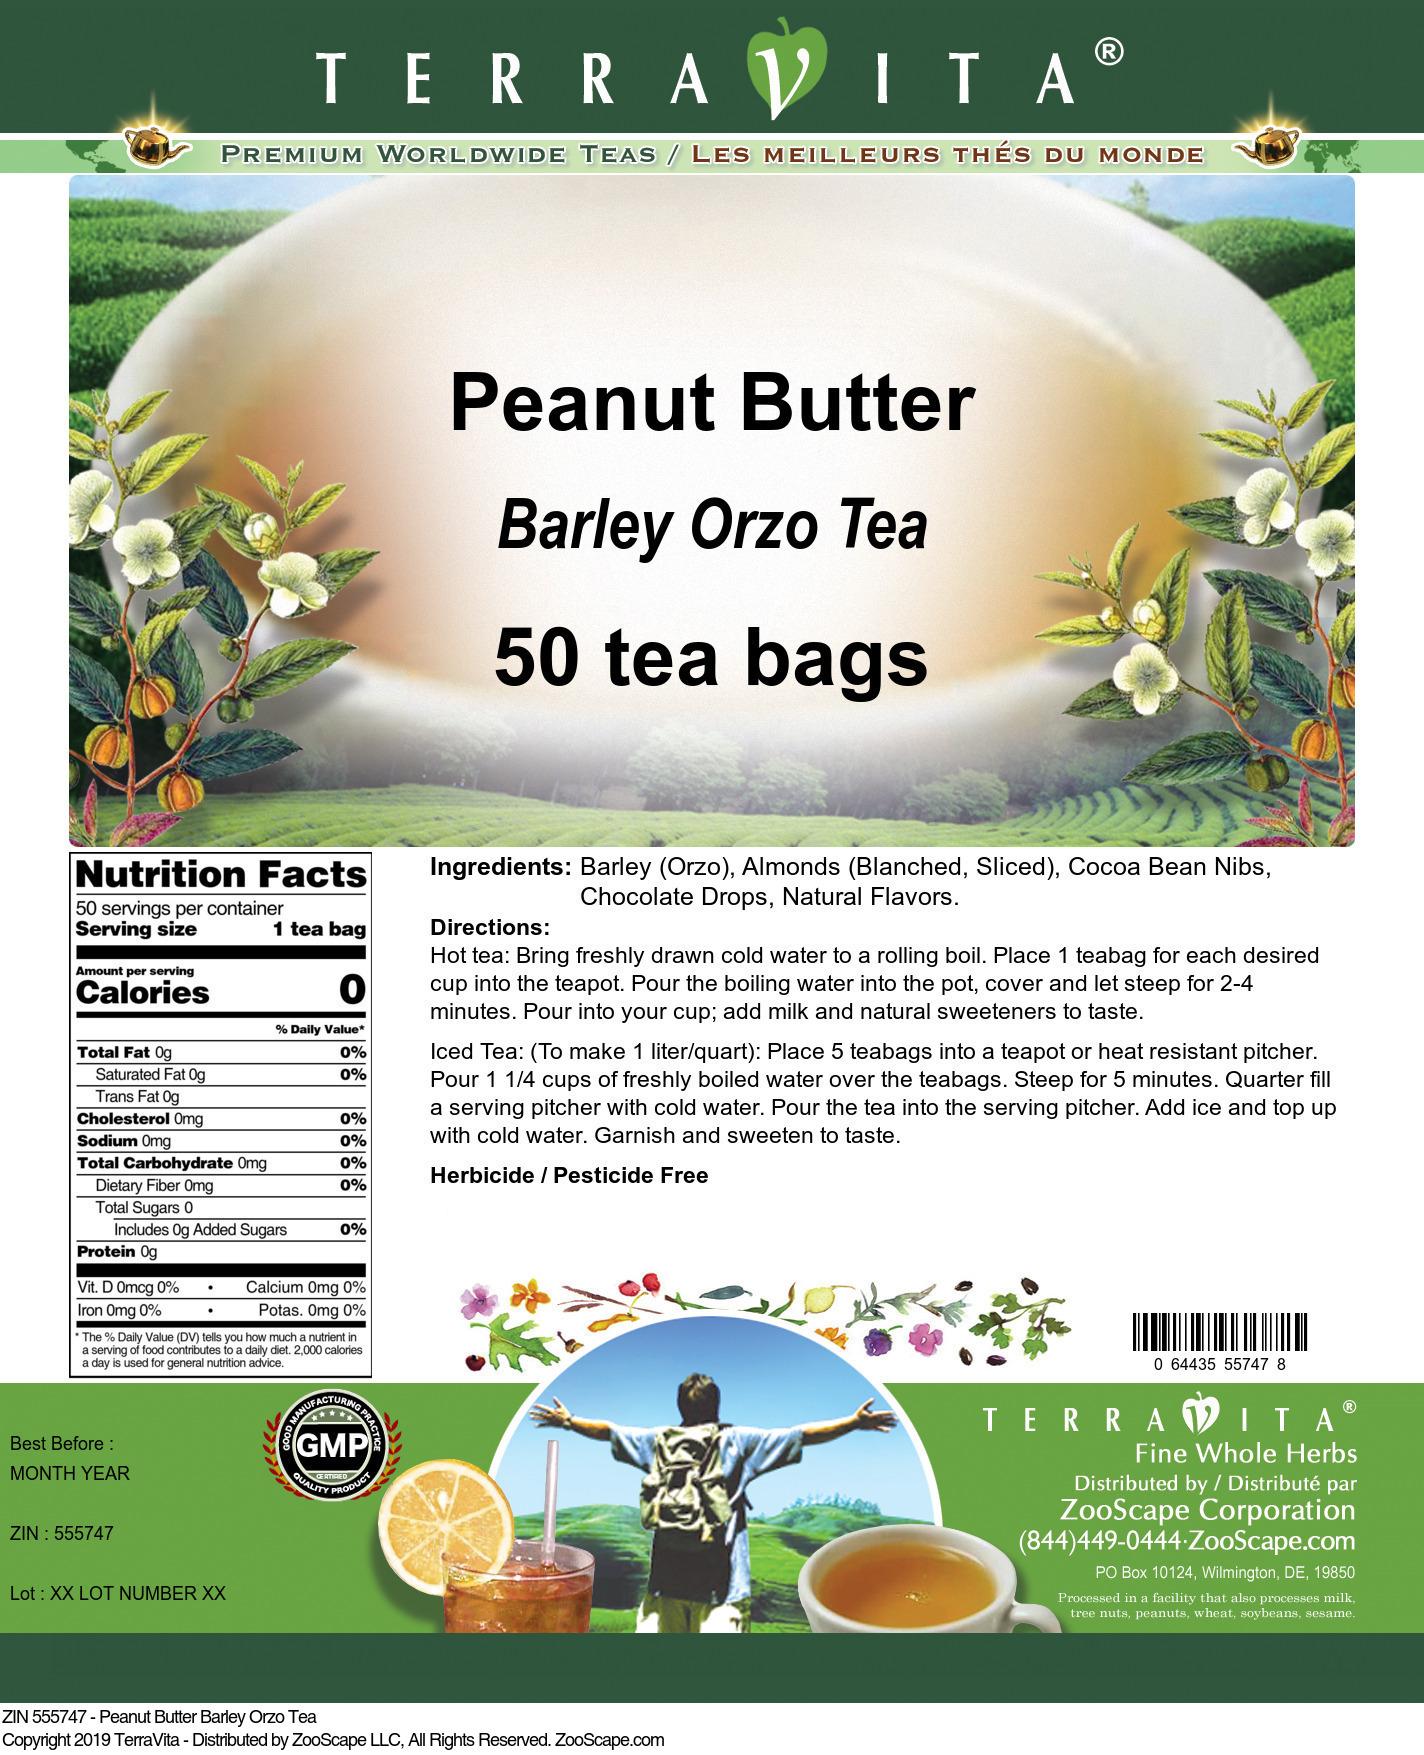 Peanut Butter Barley Orzo